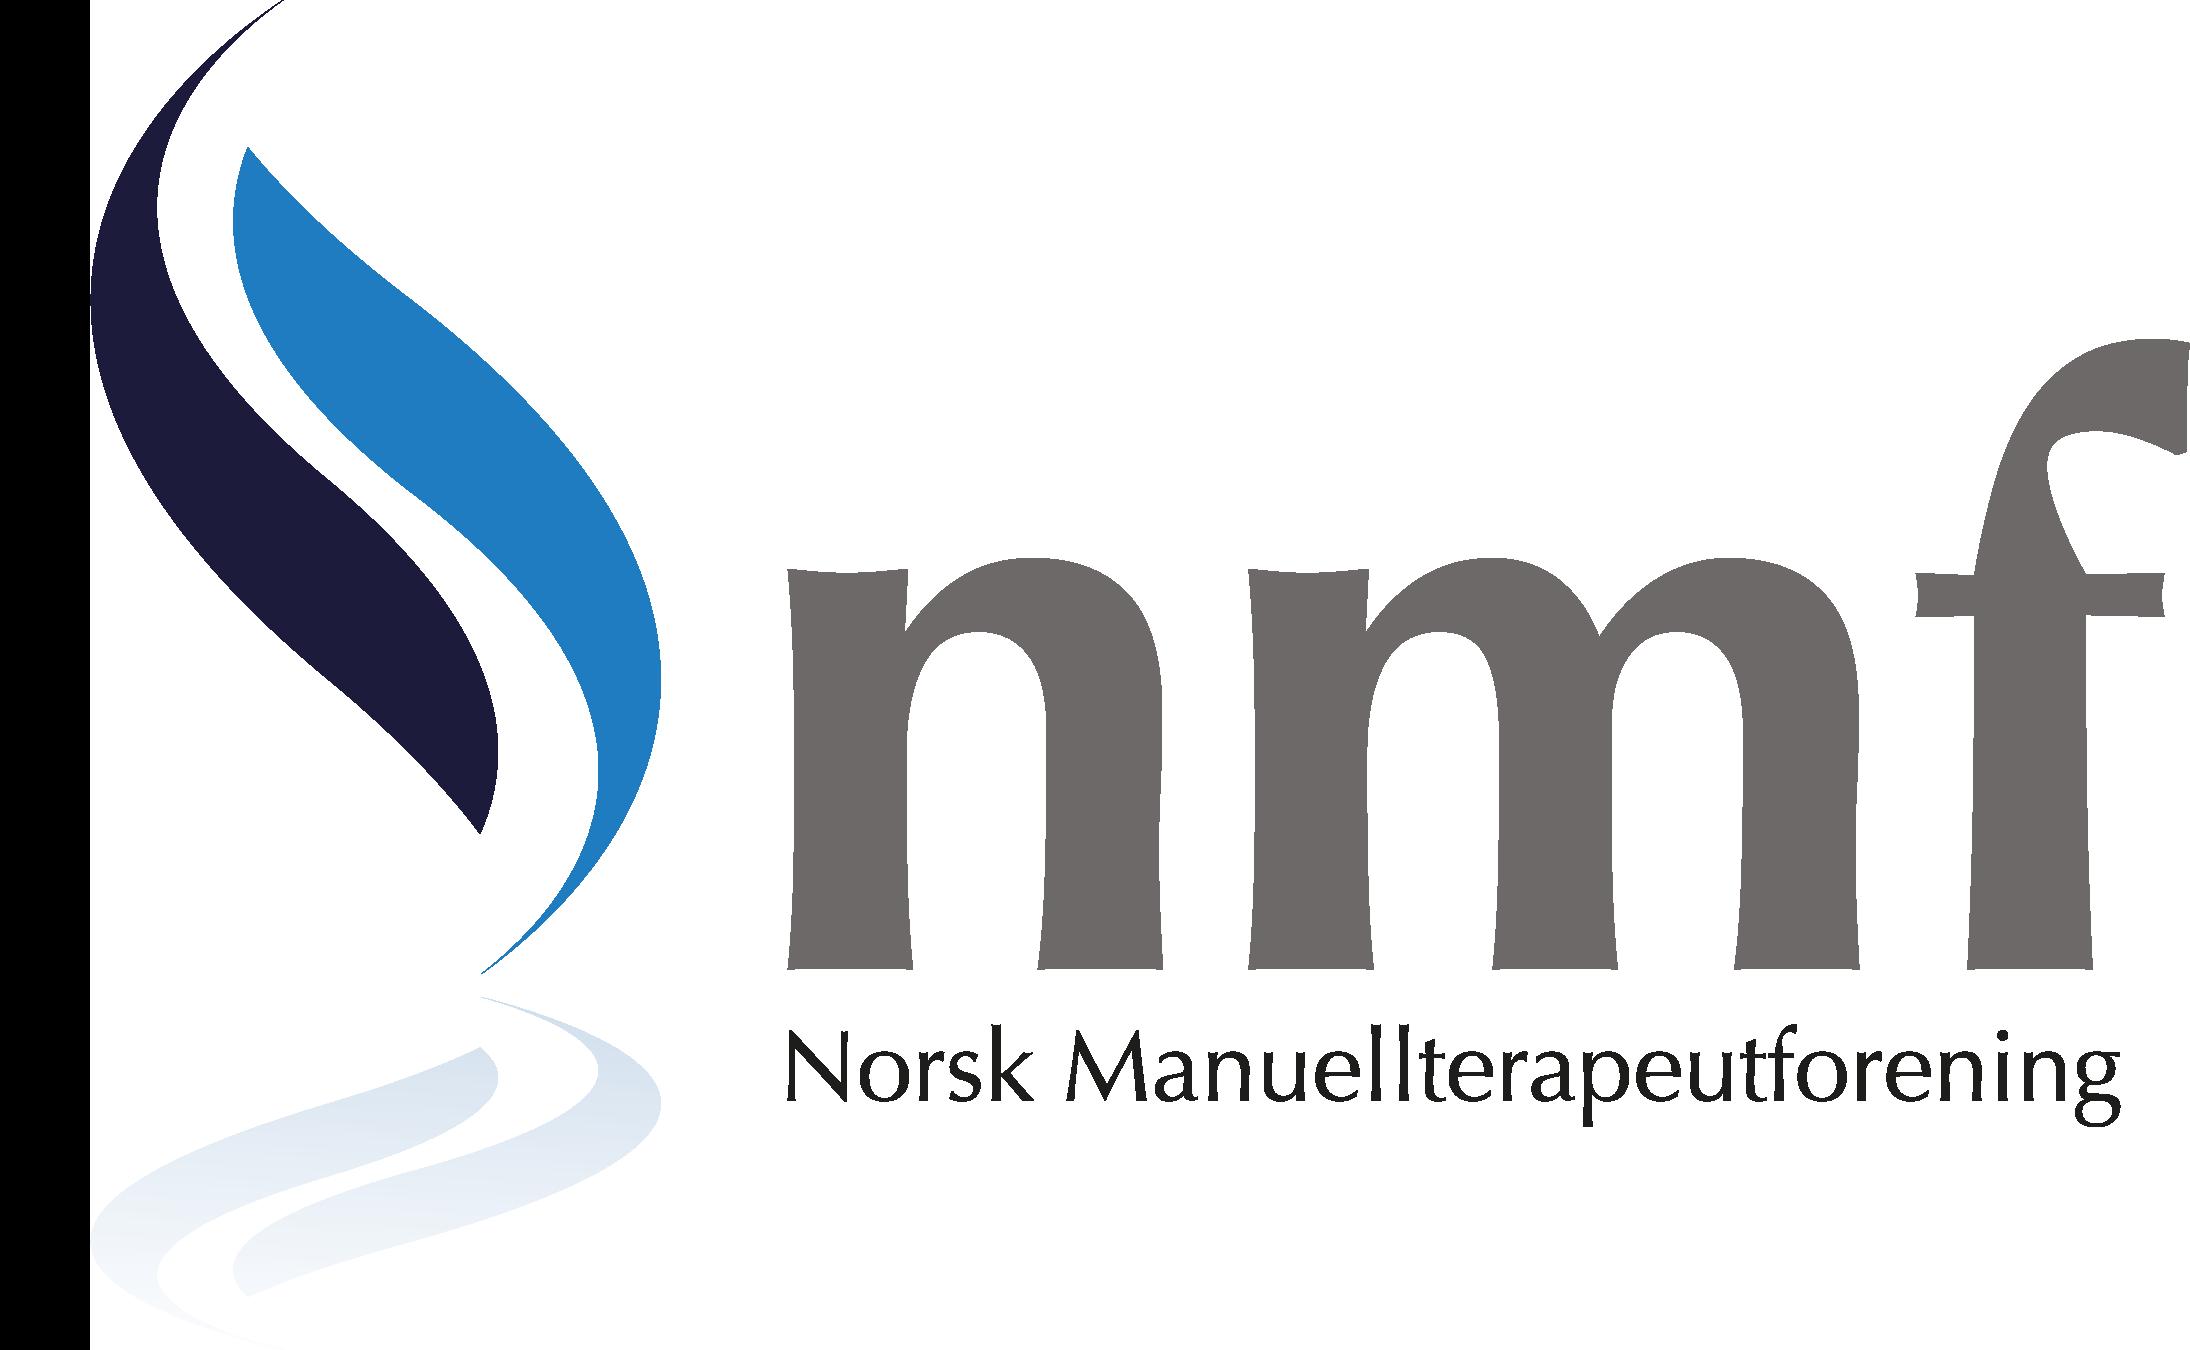 Norsk Manuellterapeutforening